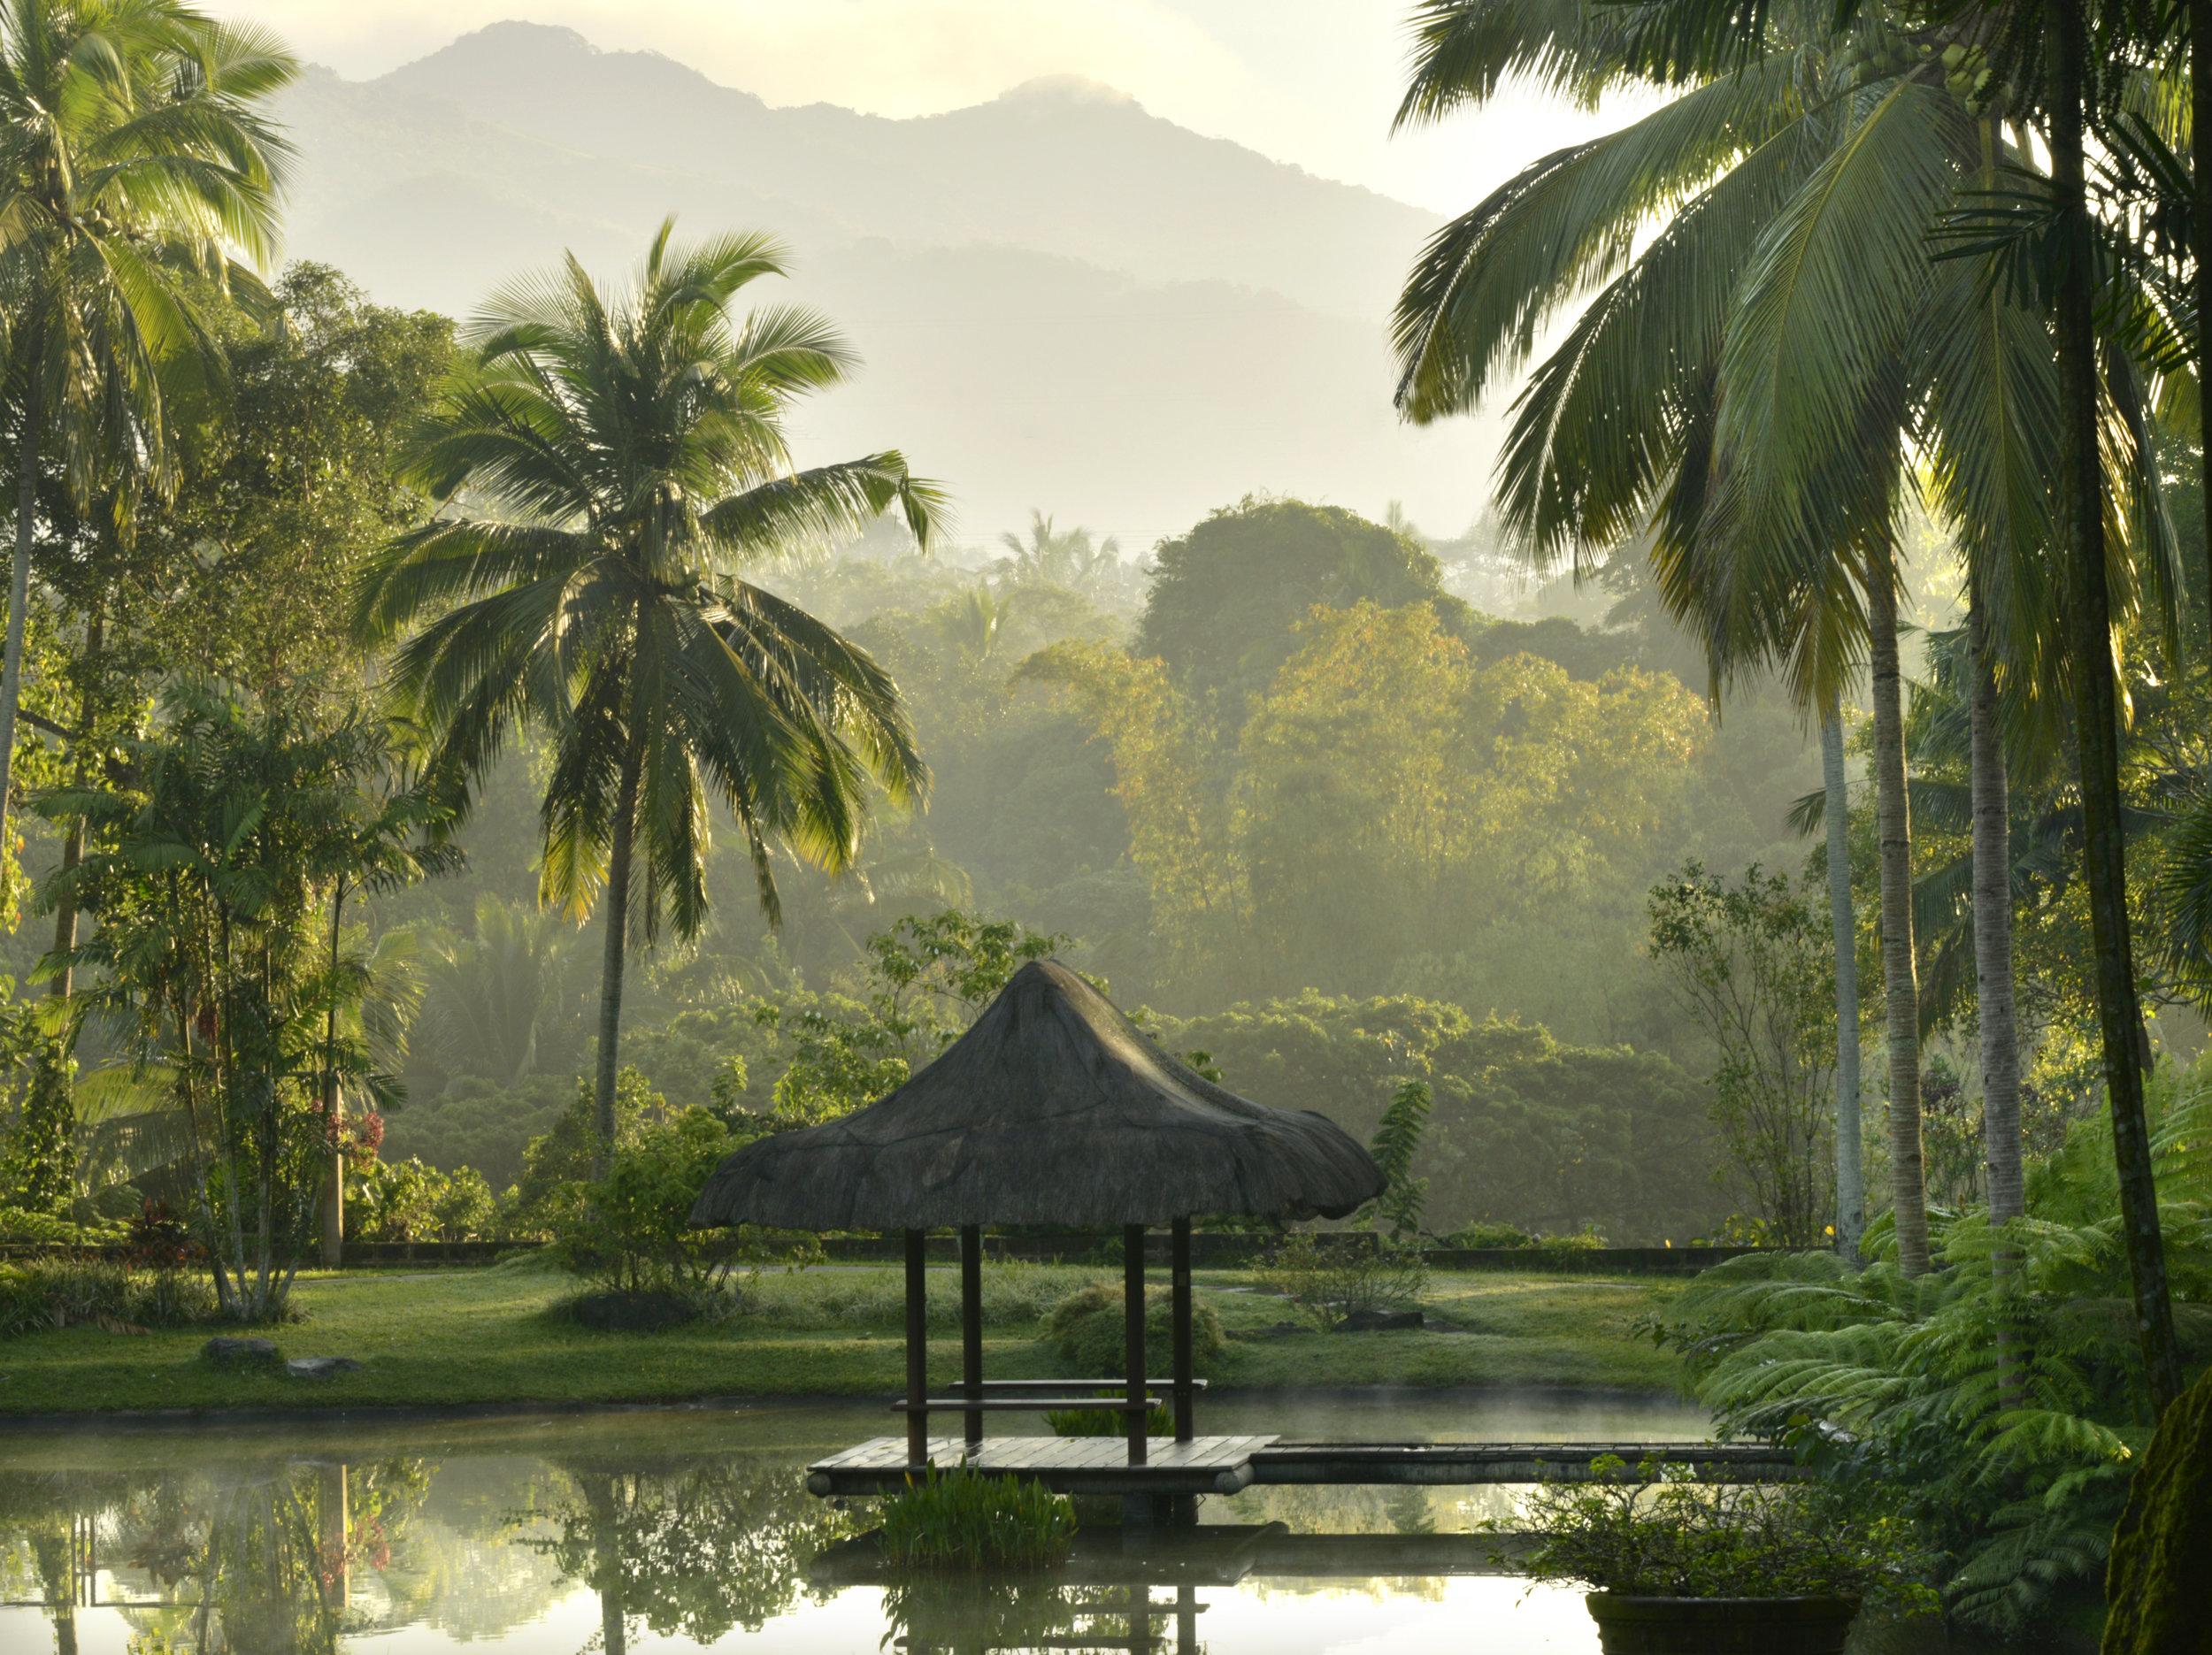 The Farm at San Benito - THAILAND